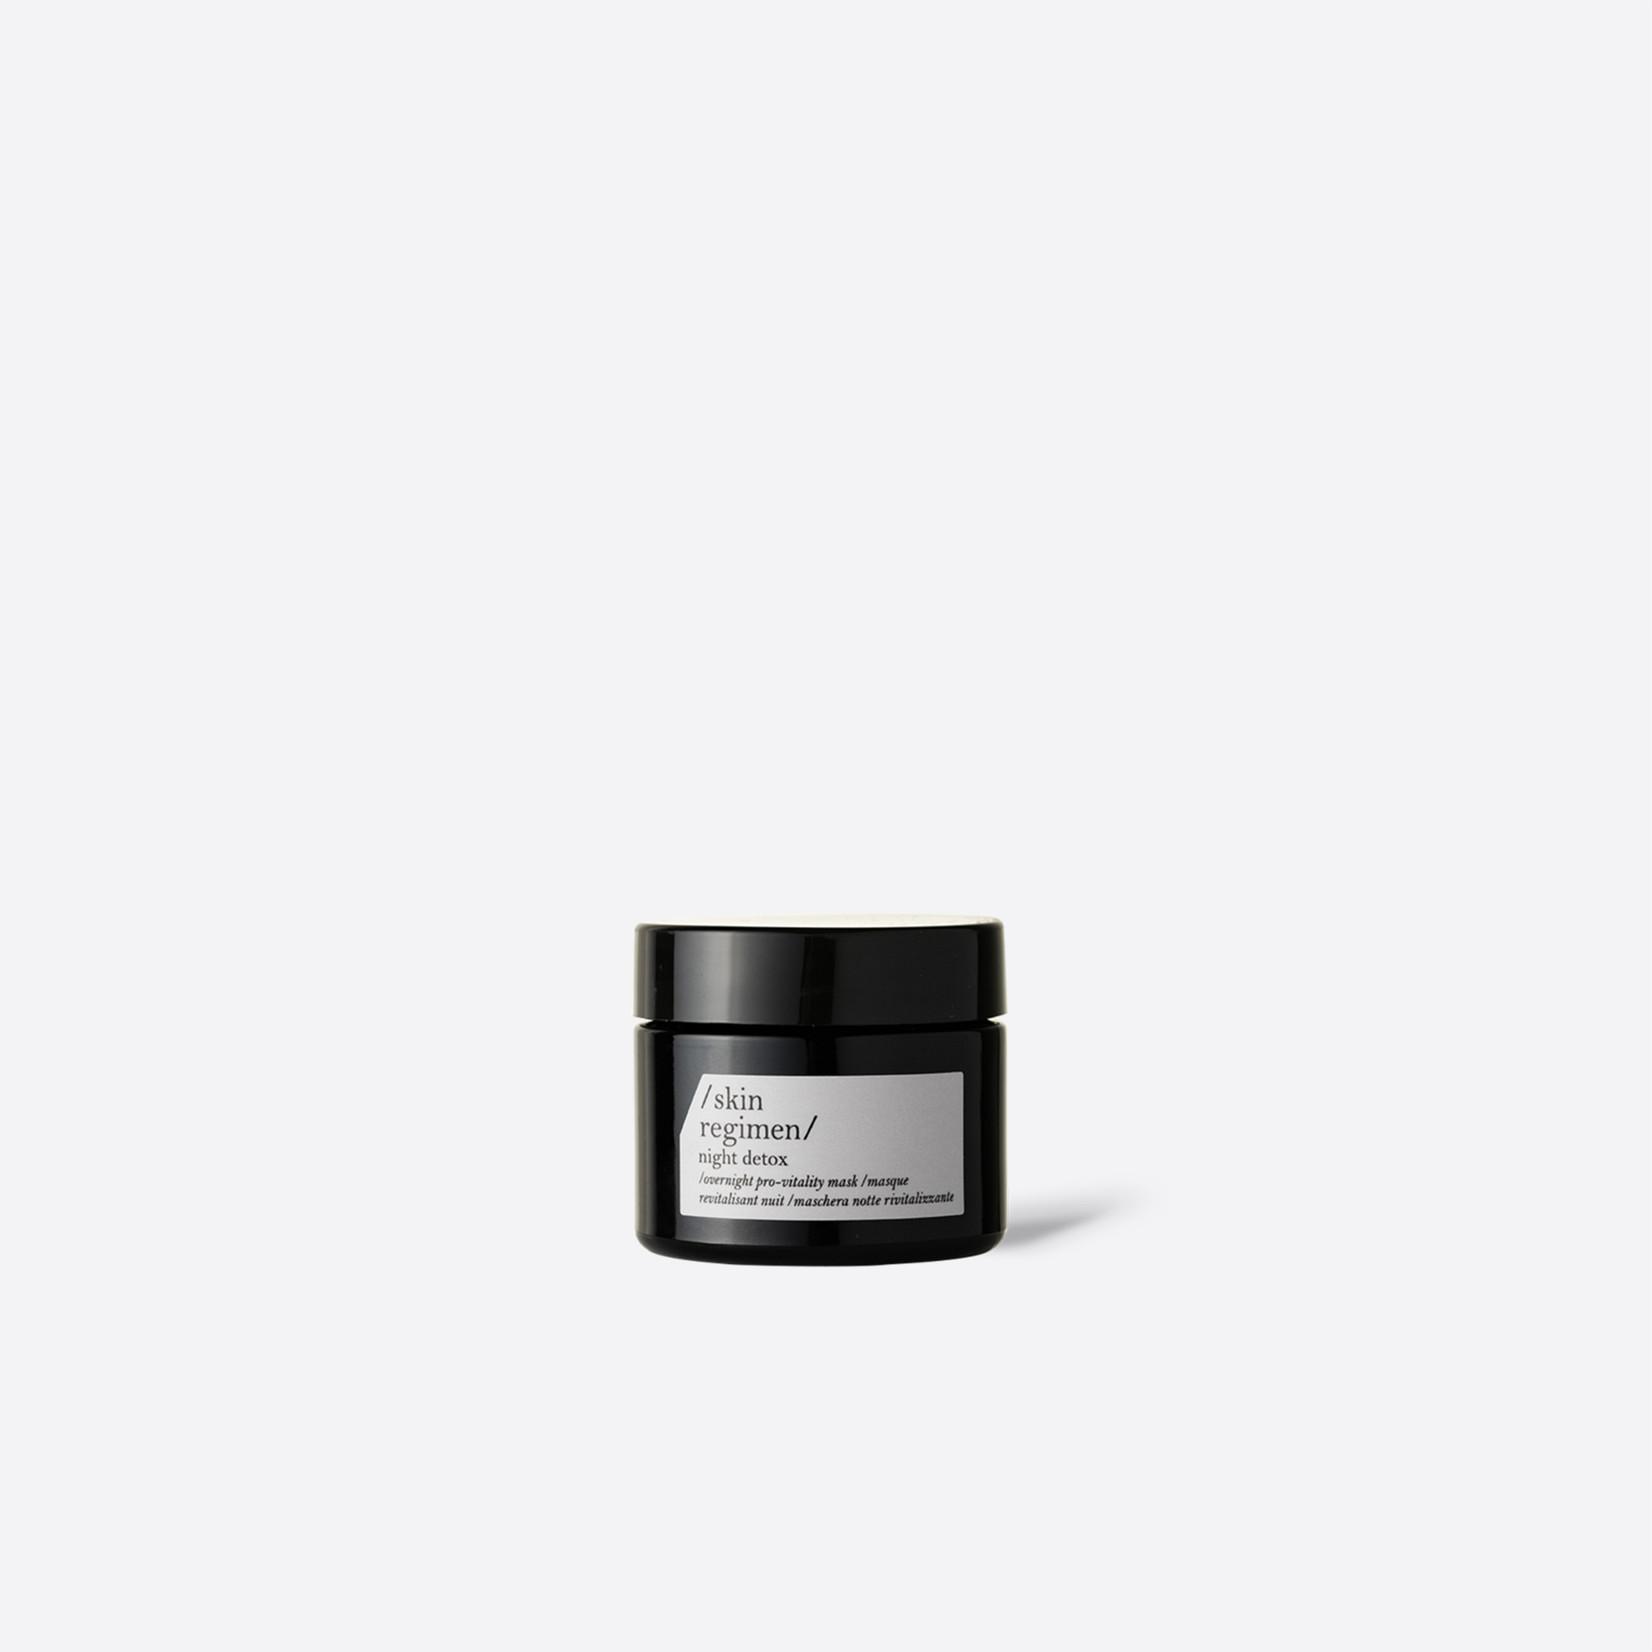 Comfort Zone Skin Regimen Night Detox Cream